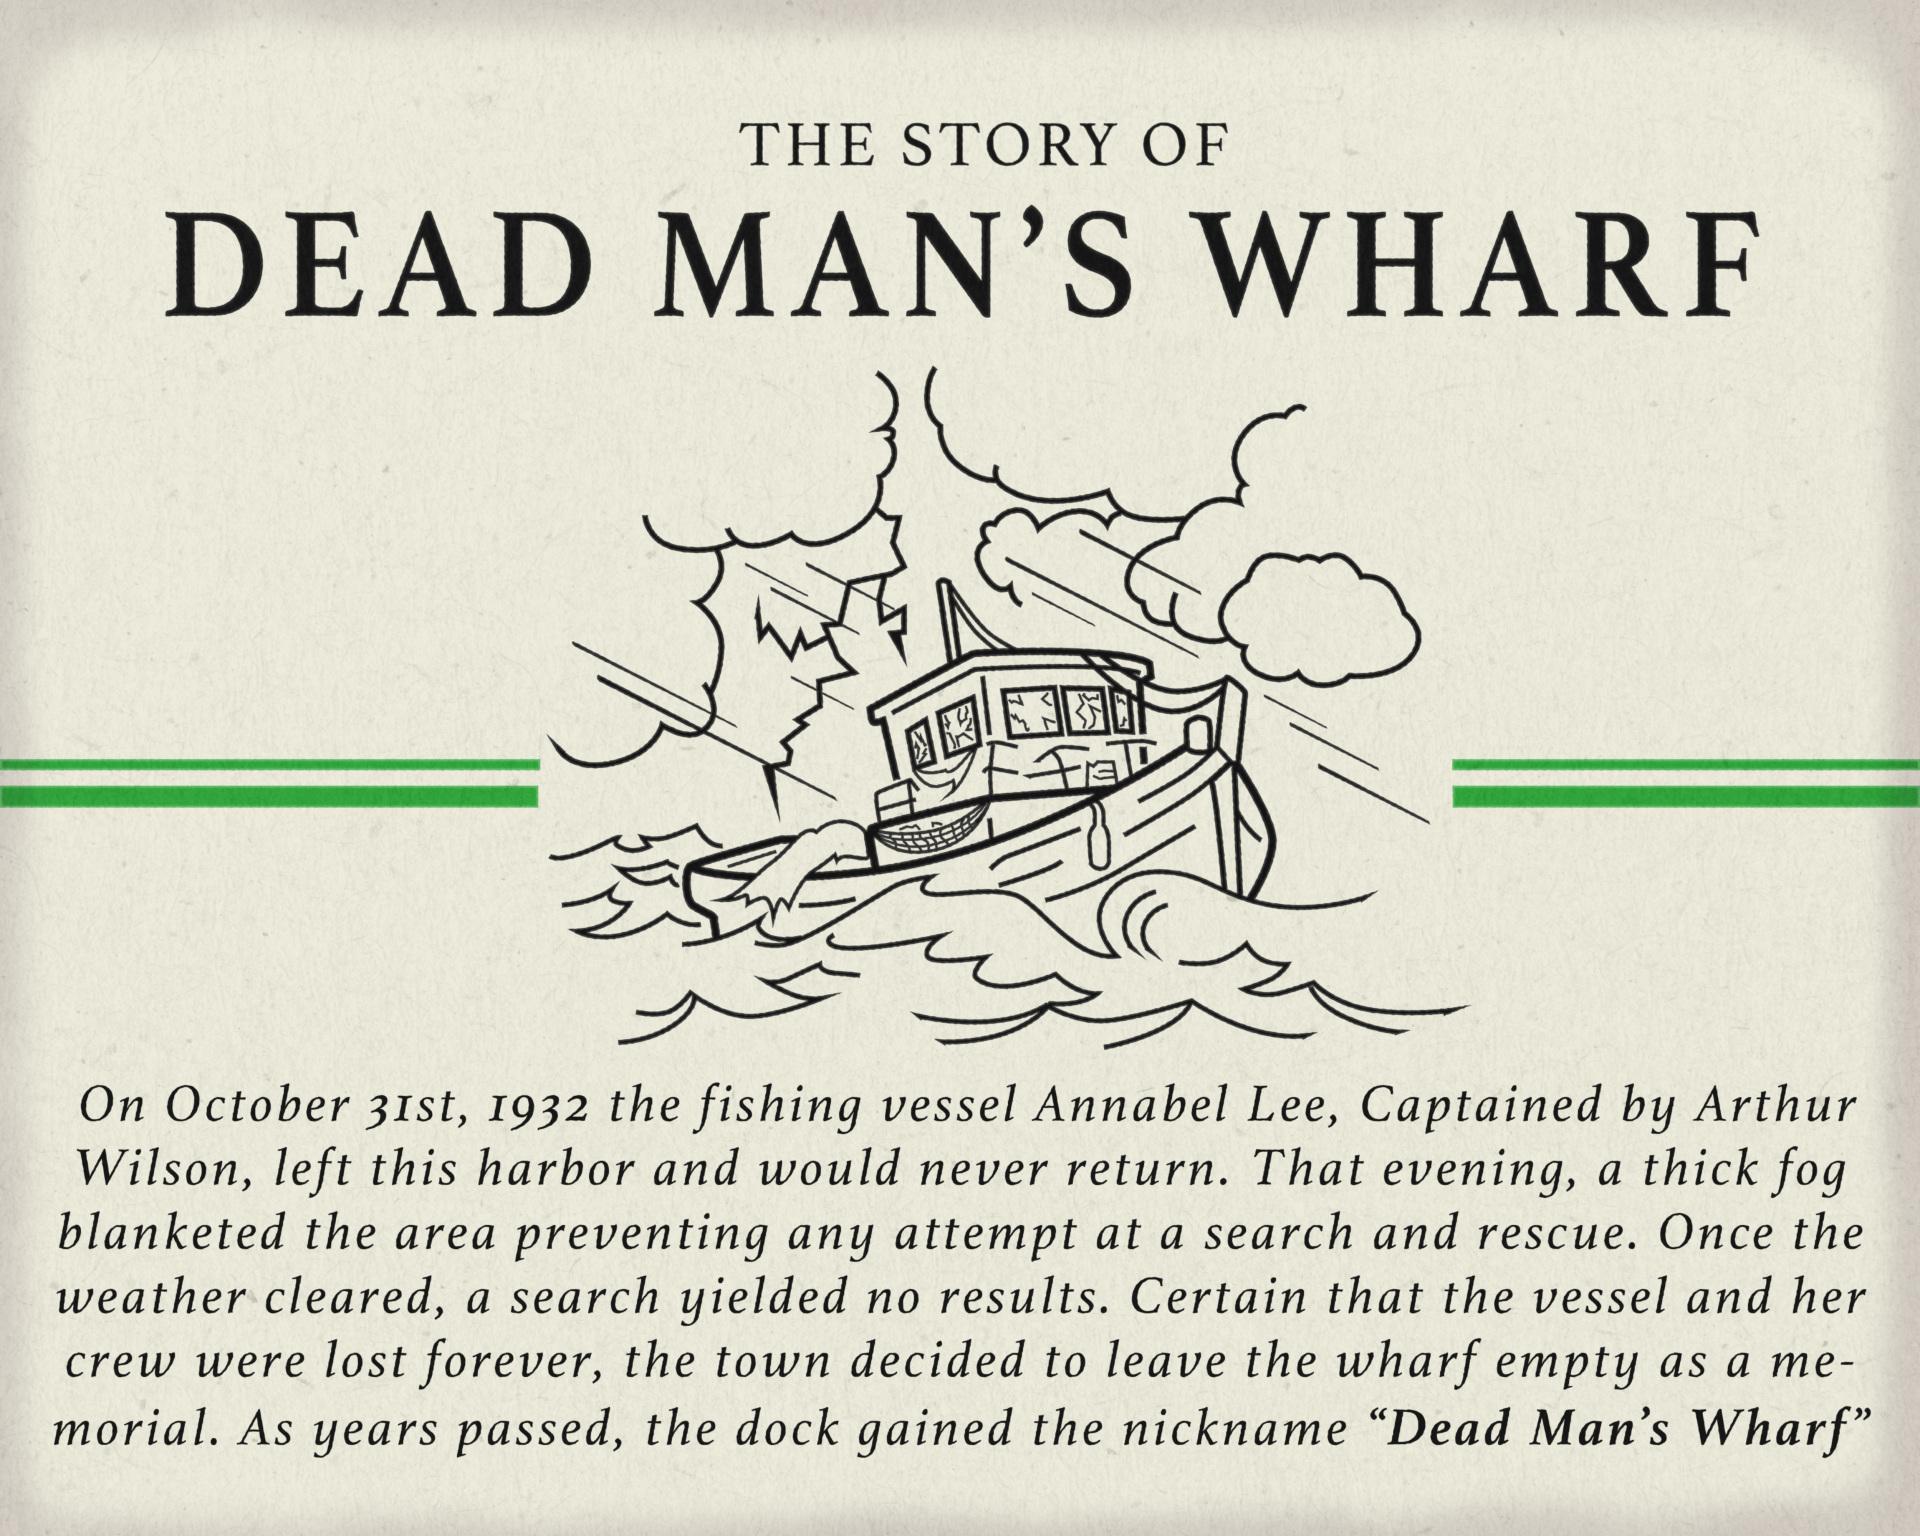 DeadMansWharf.jpg